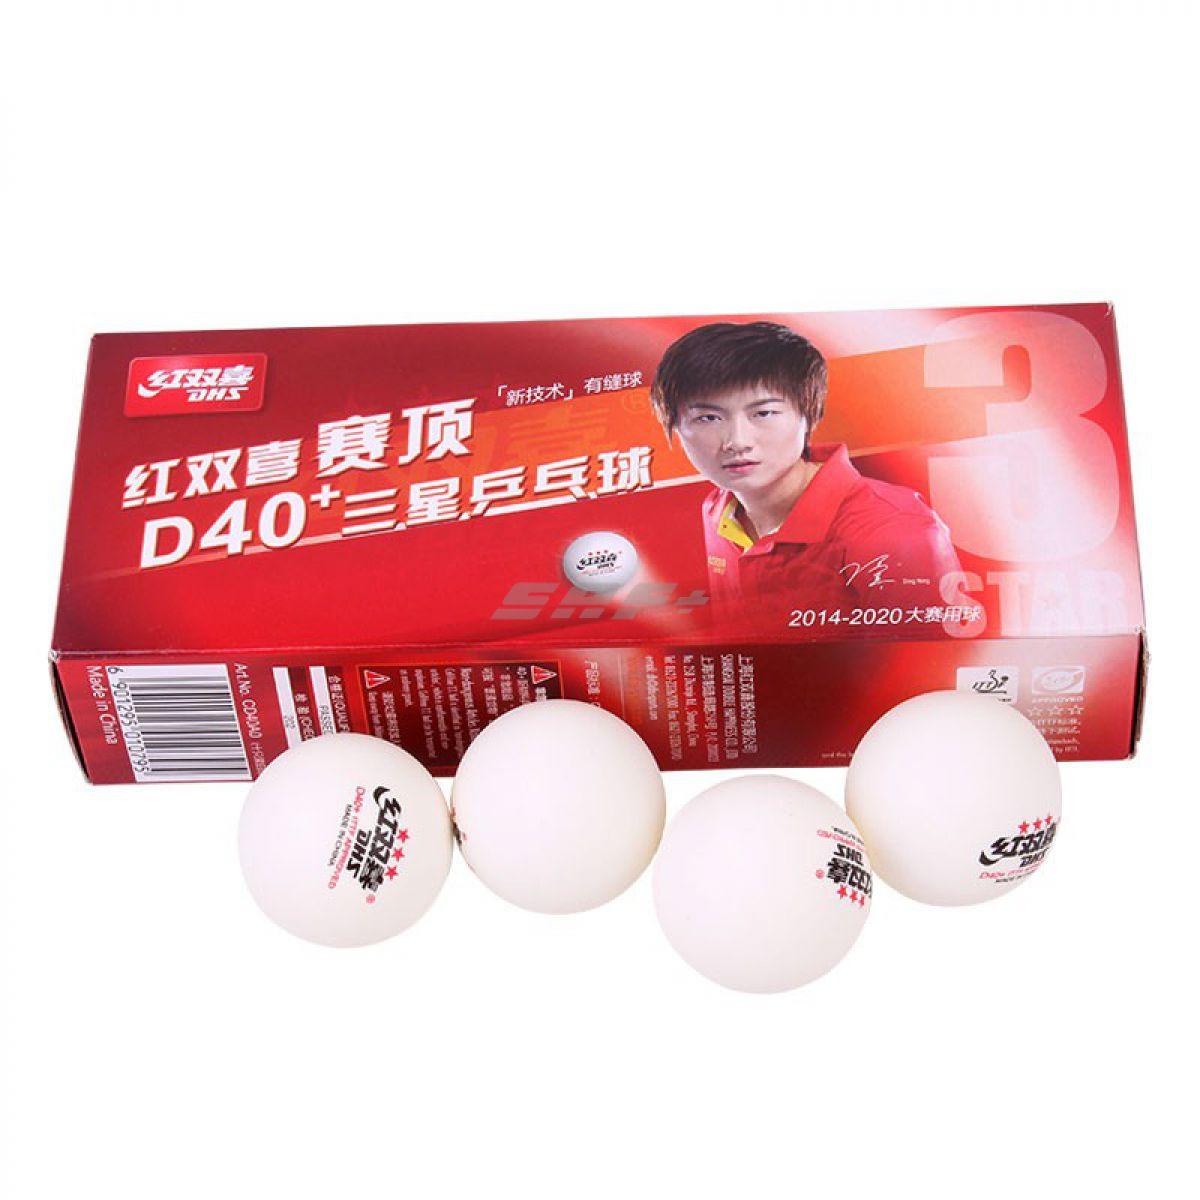 Мяч для настольного тенниса DHS 3***